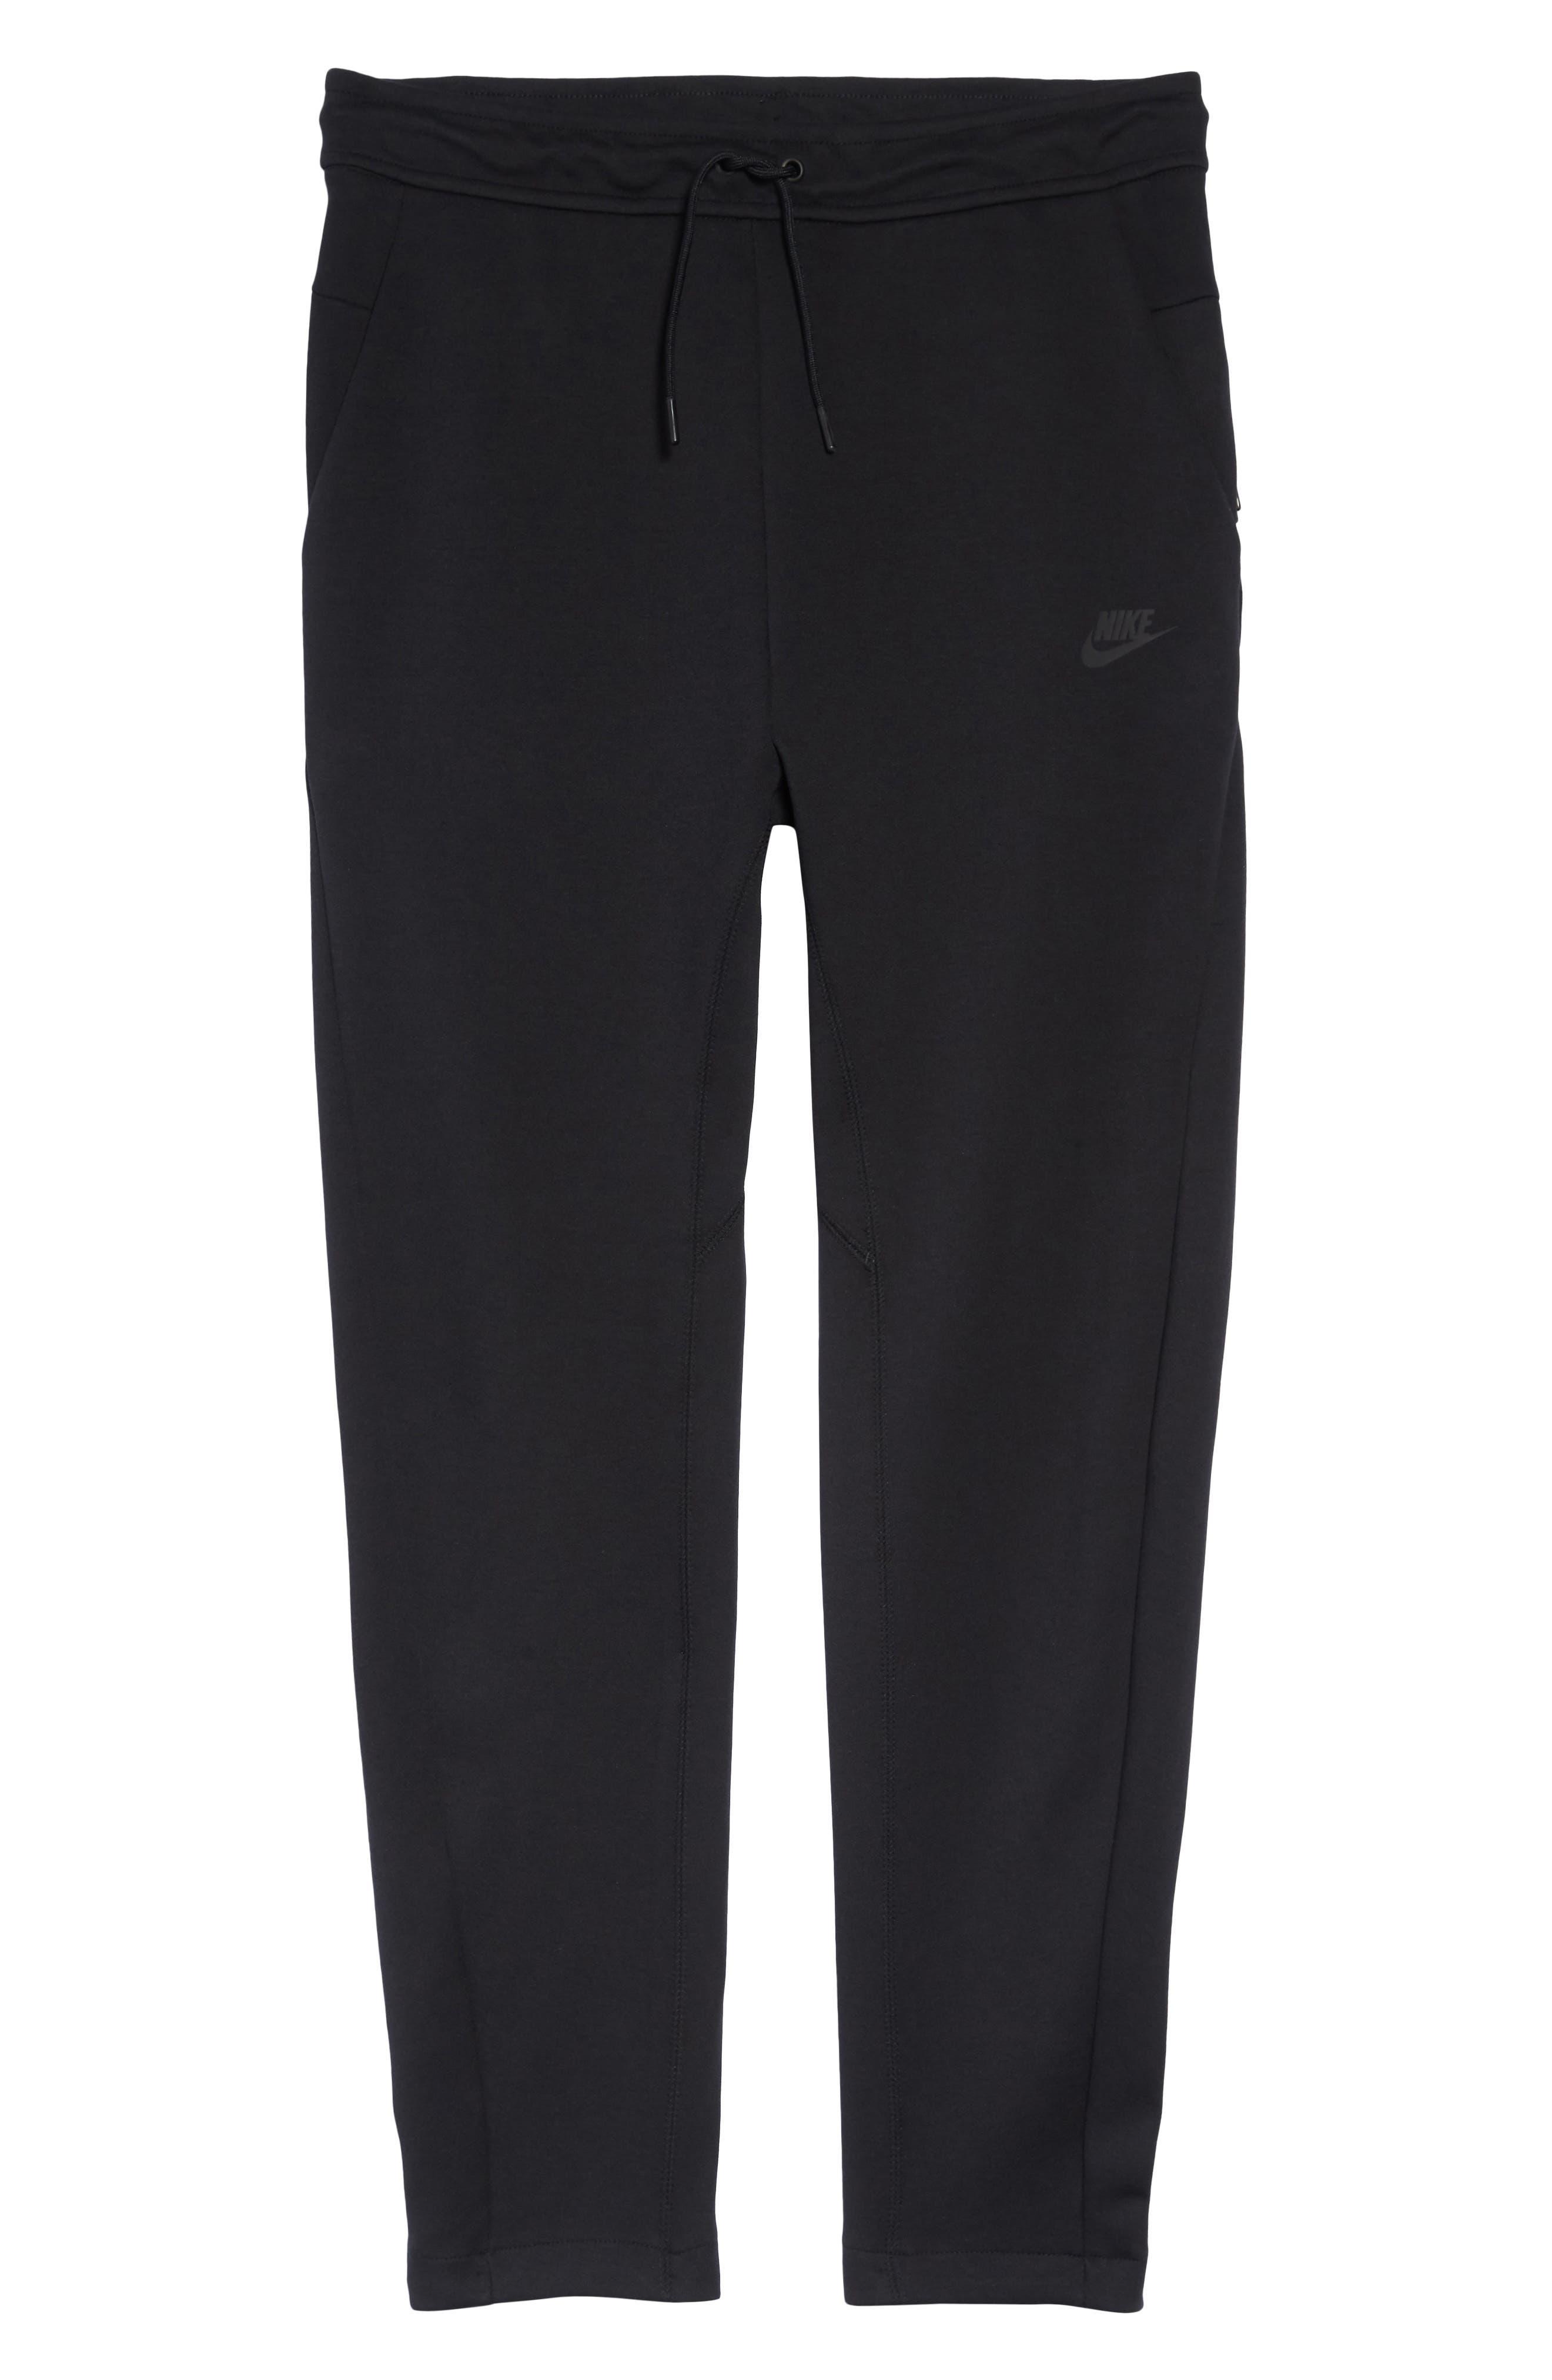 Tech Fleece Pants,                             Alternate thumbnail 6, color,                             BLACK/ BLACK